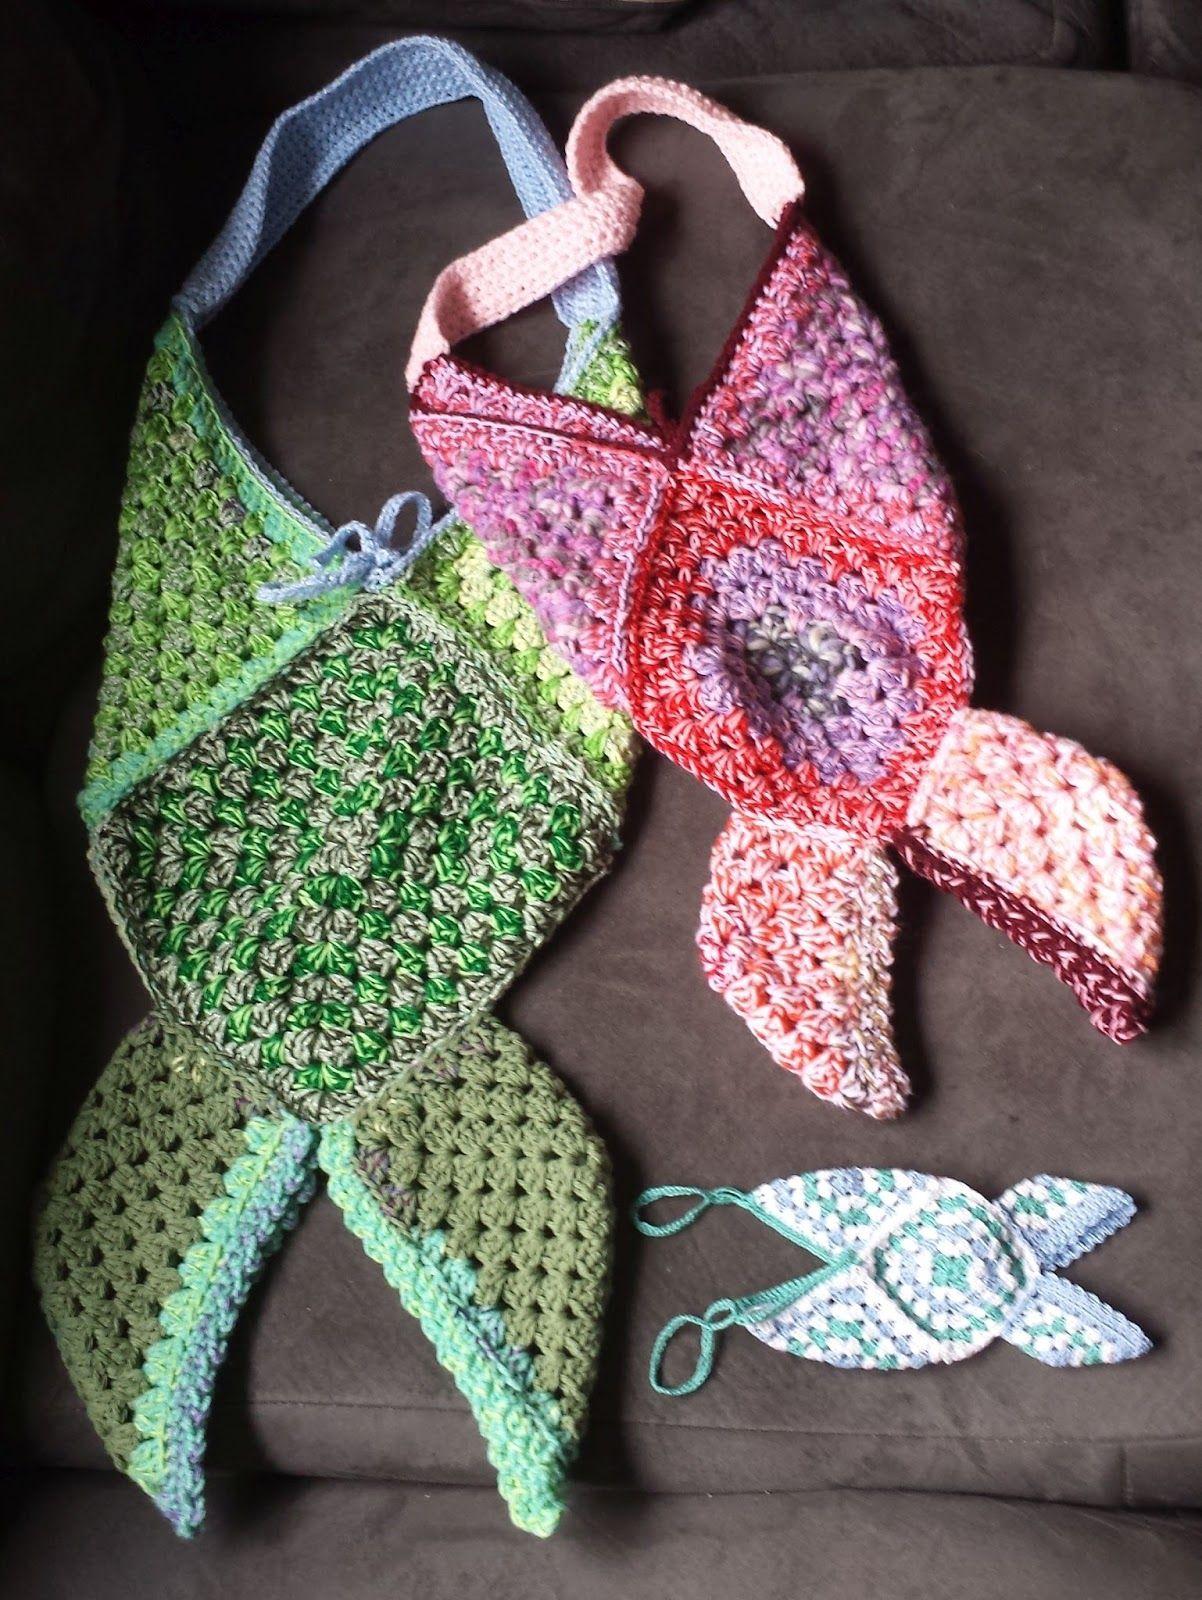 365 crochet granny square mermaidfish tail bag free crochet granny square mermaidfish tail bag free crochet pattern bankloansurffo Choice Image